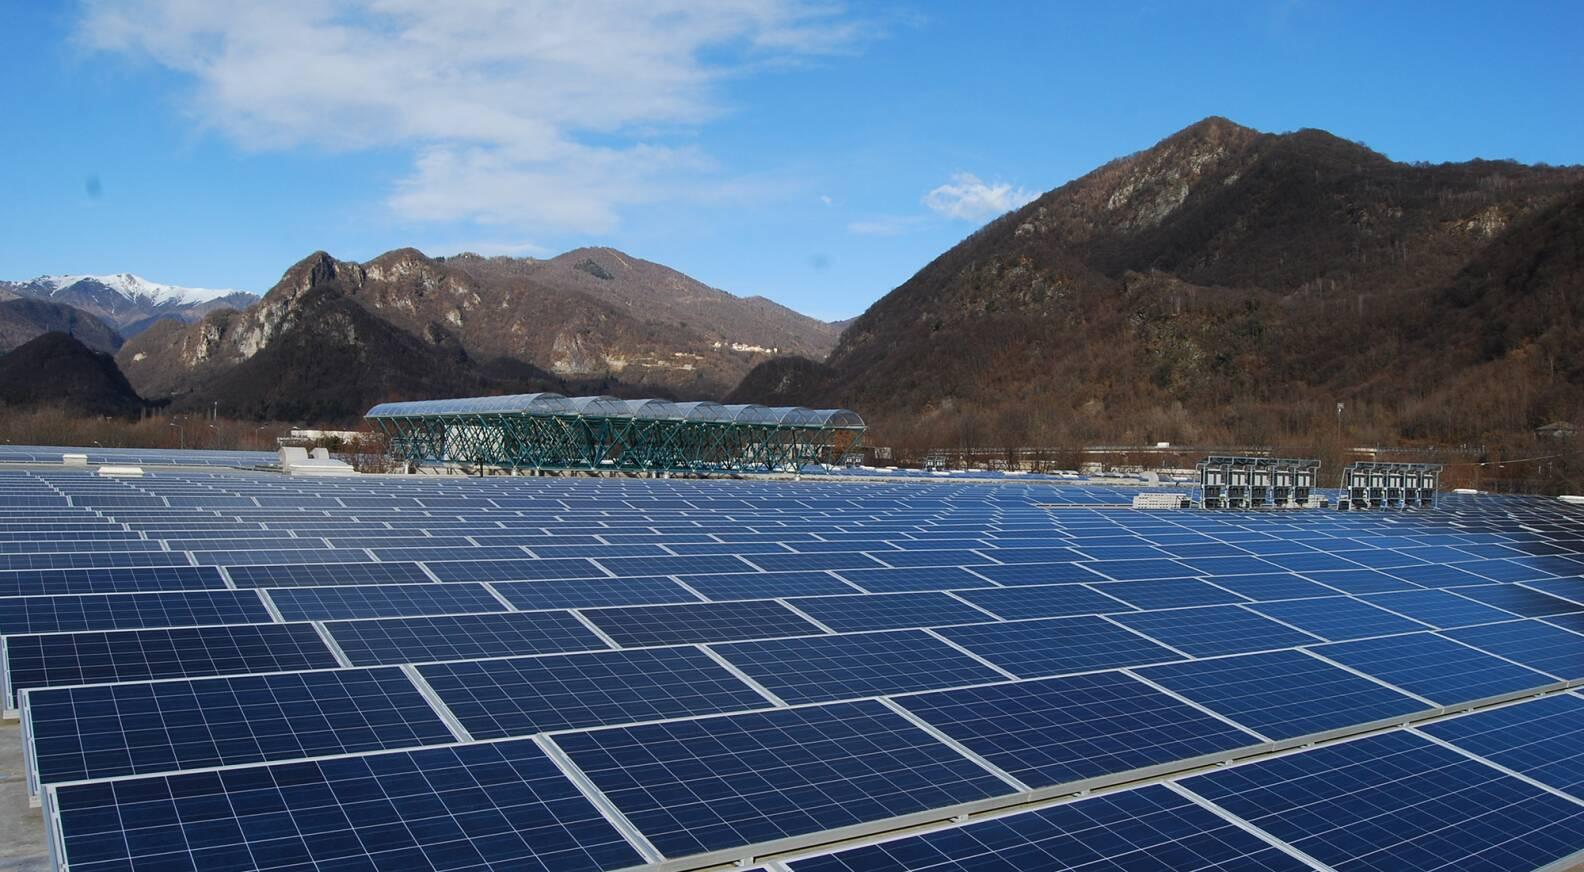 LVMH Houses powered by renewable energies! - LVMH